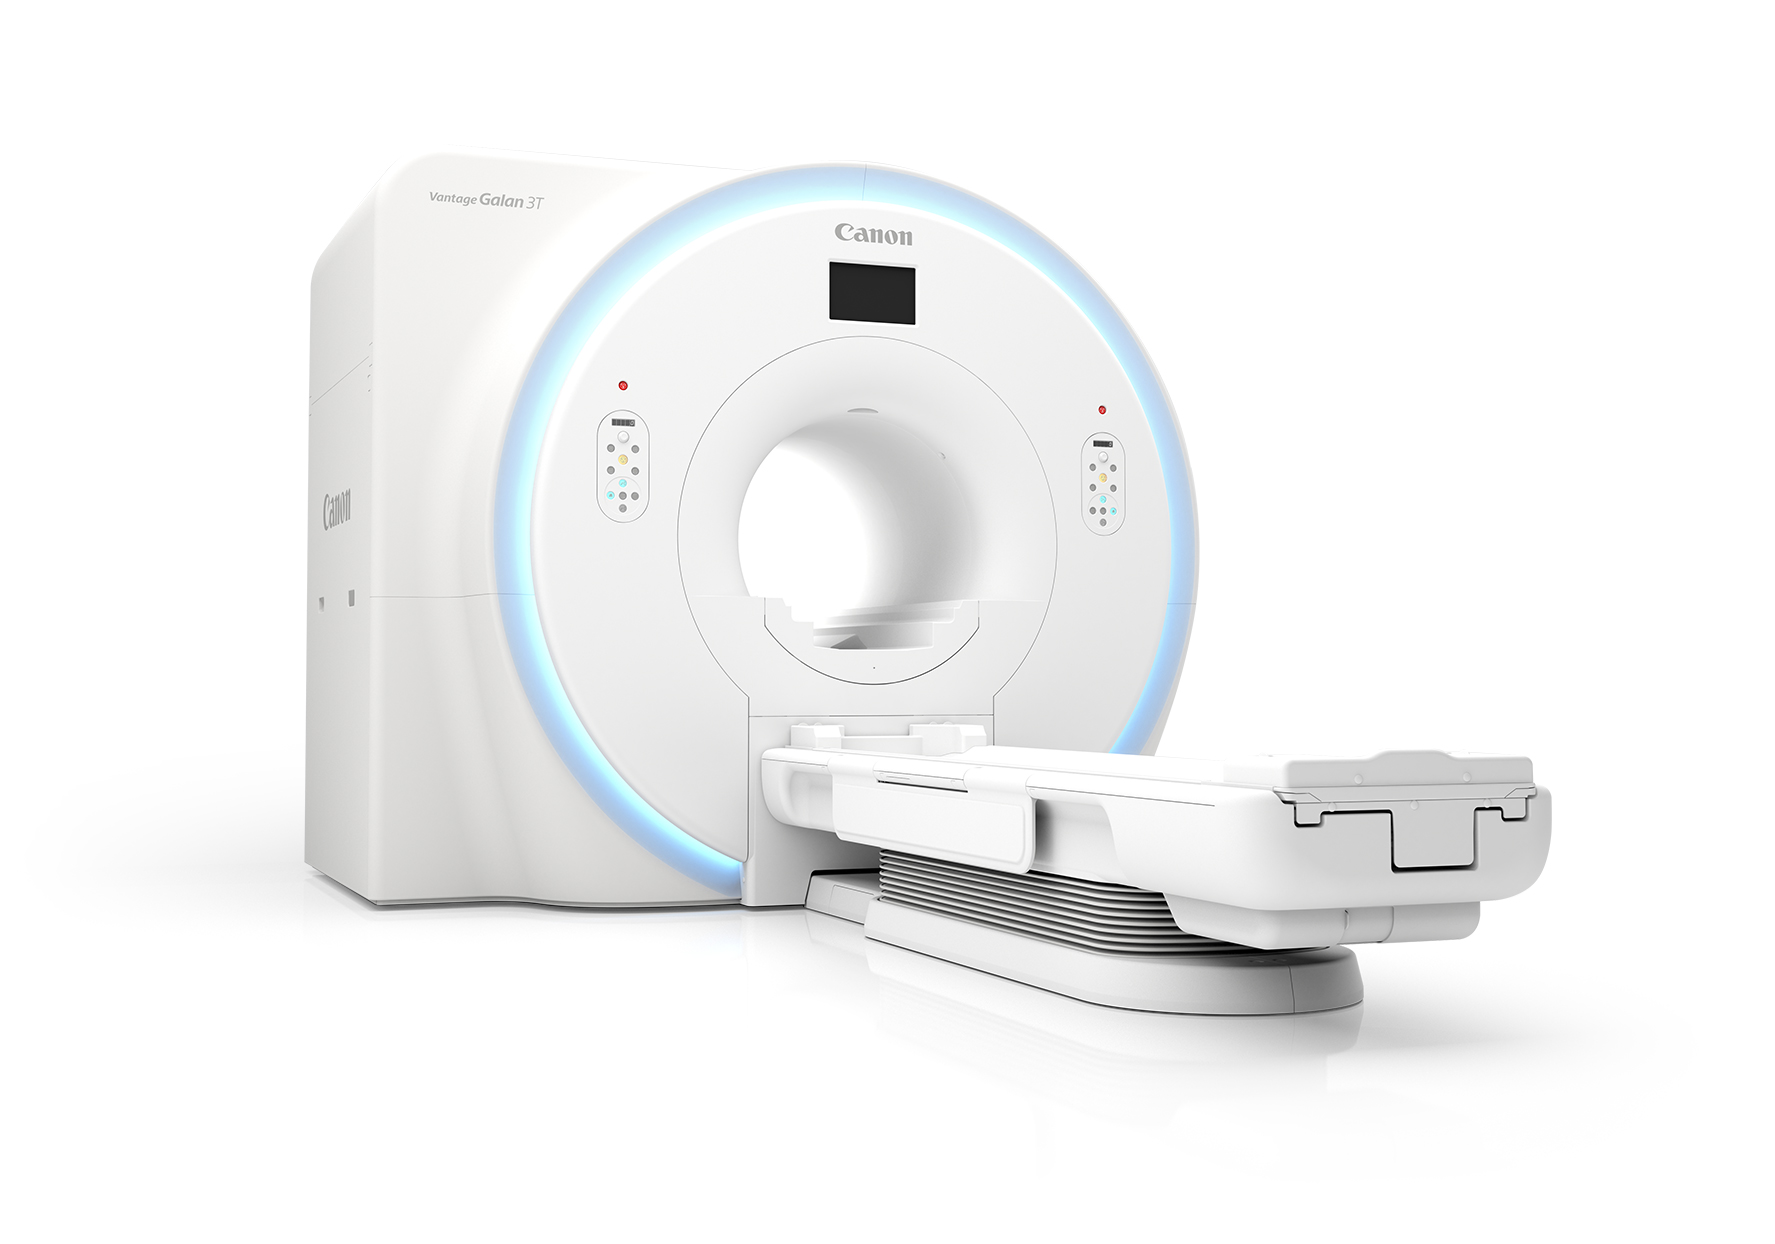 Vantage Galan 3T MRI Machine